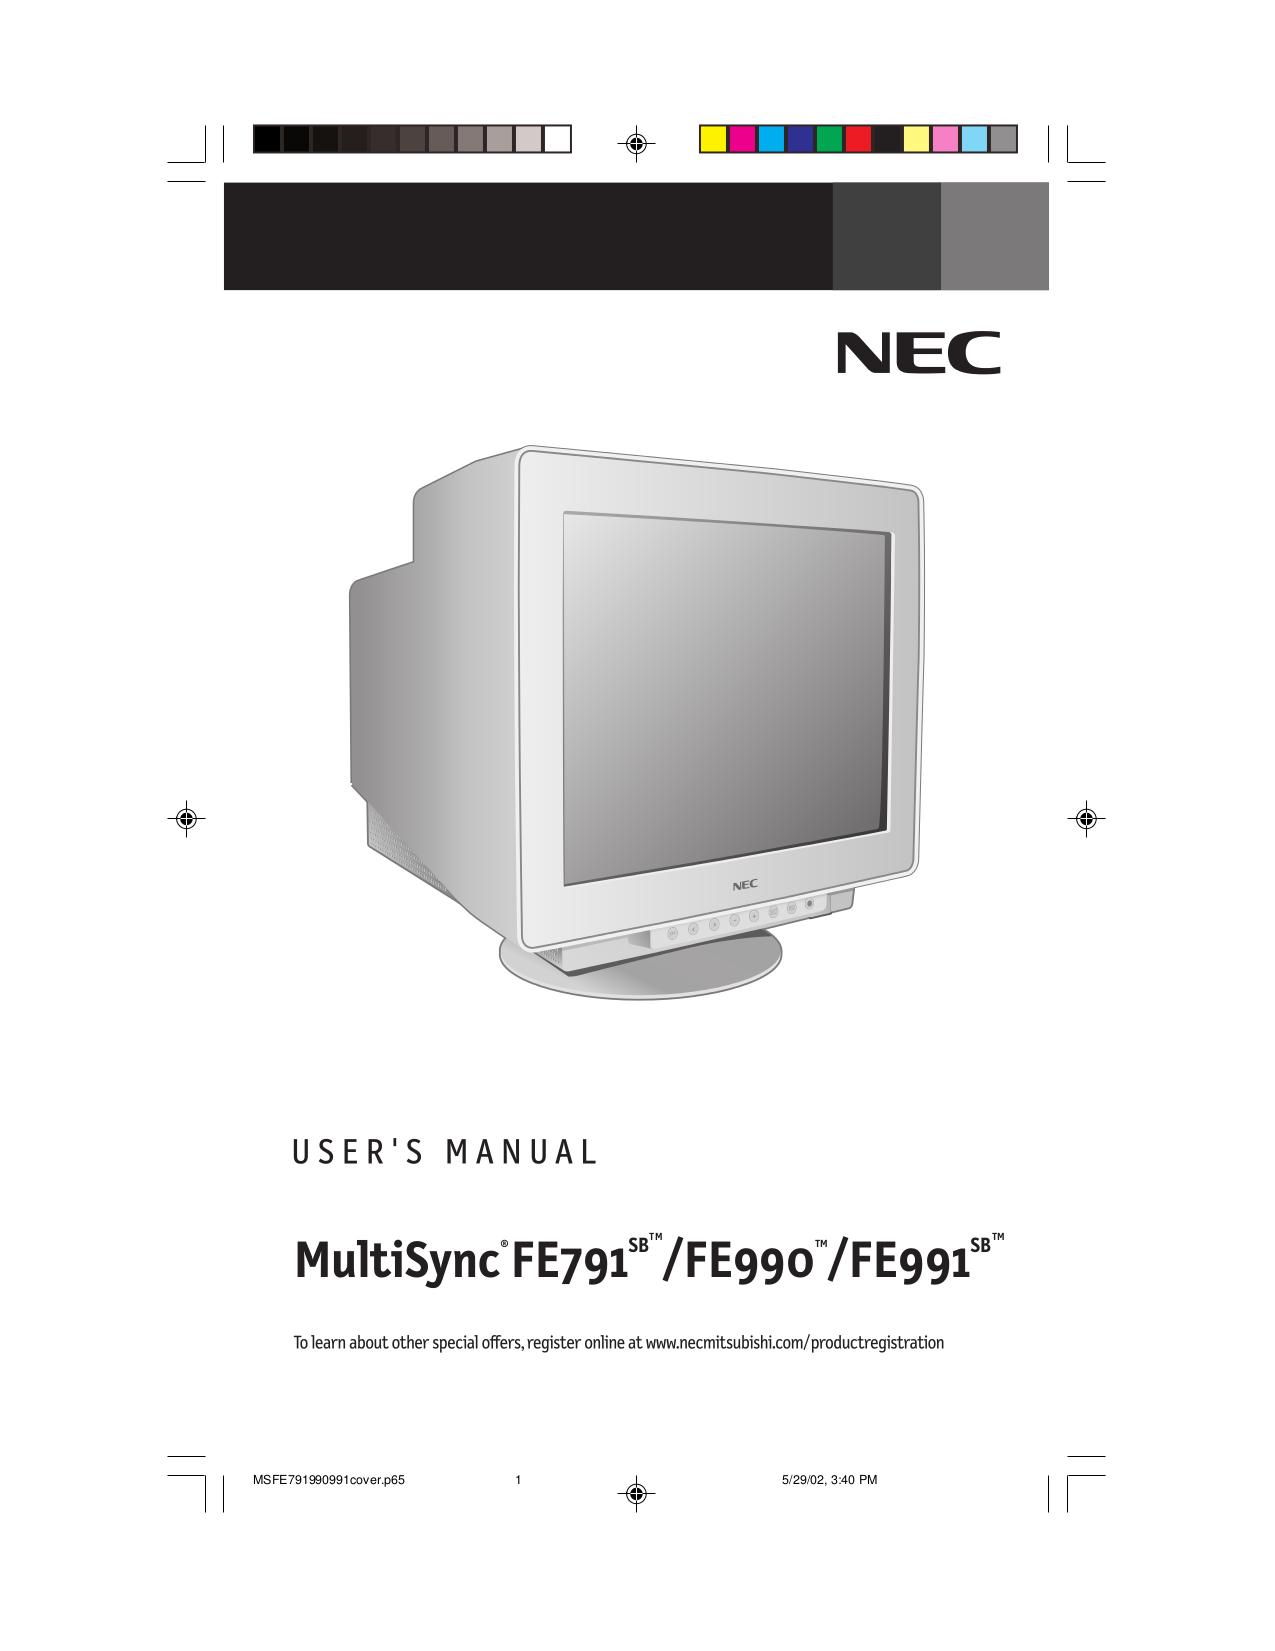 Nec online manual array nec v230 user manual pdf download 1394841 girlietalk info rh girlietalk info fandeluxe Image collections